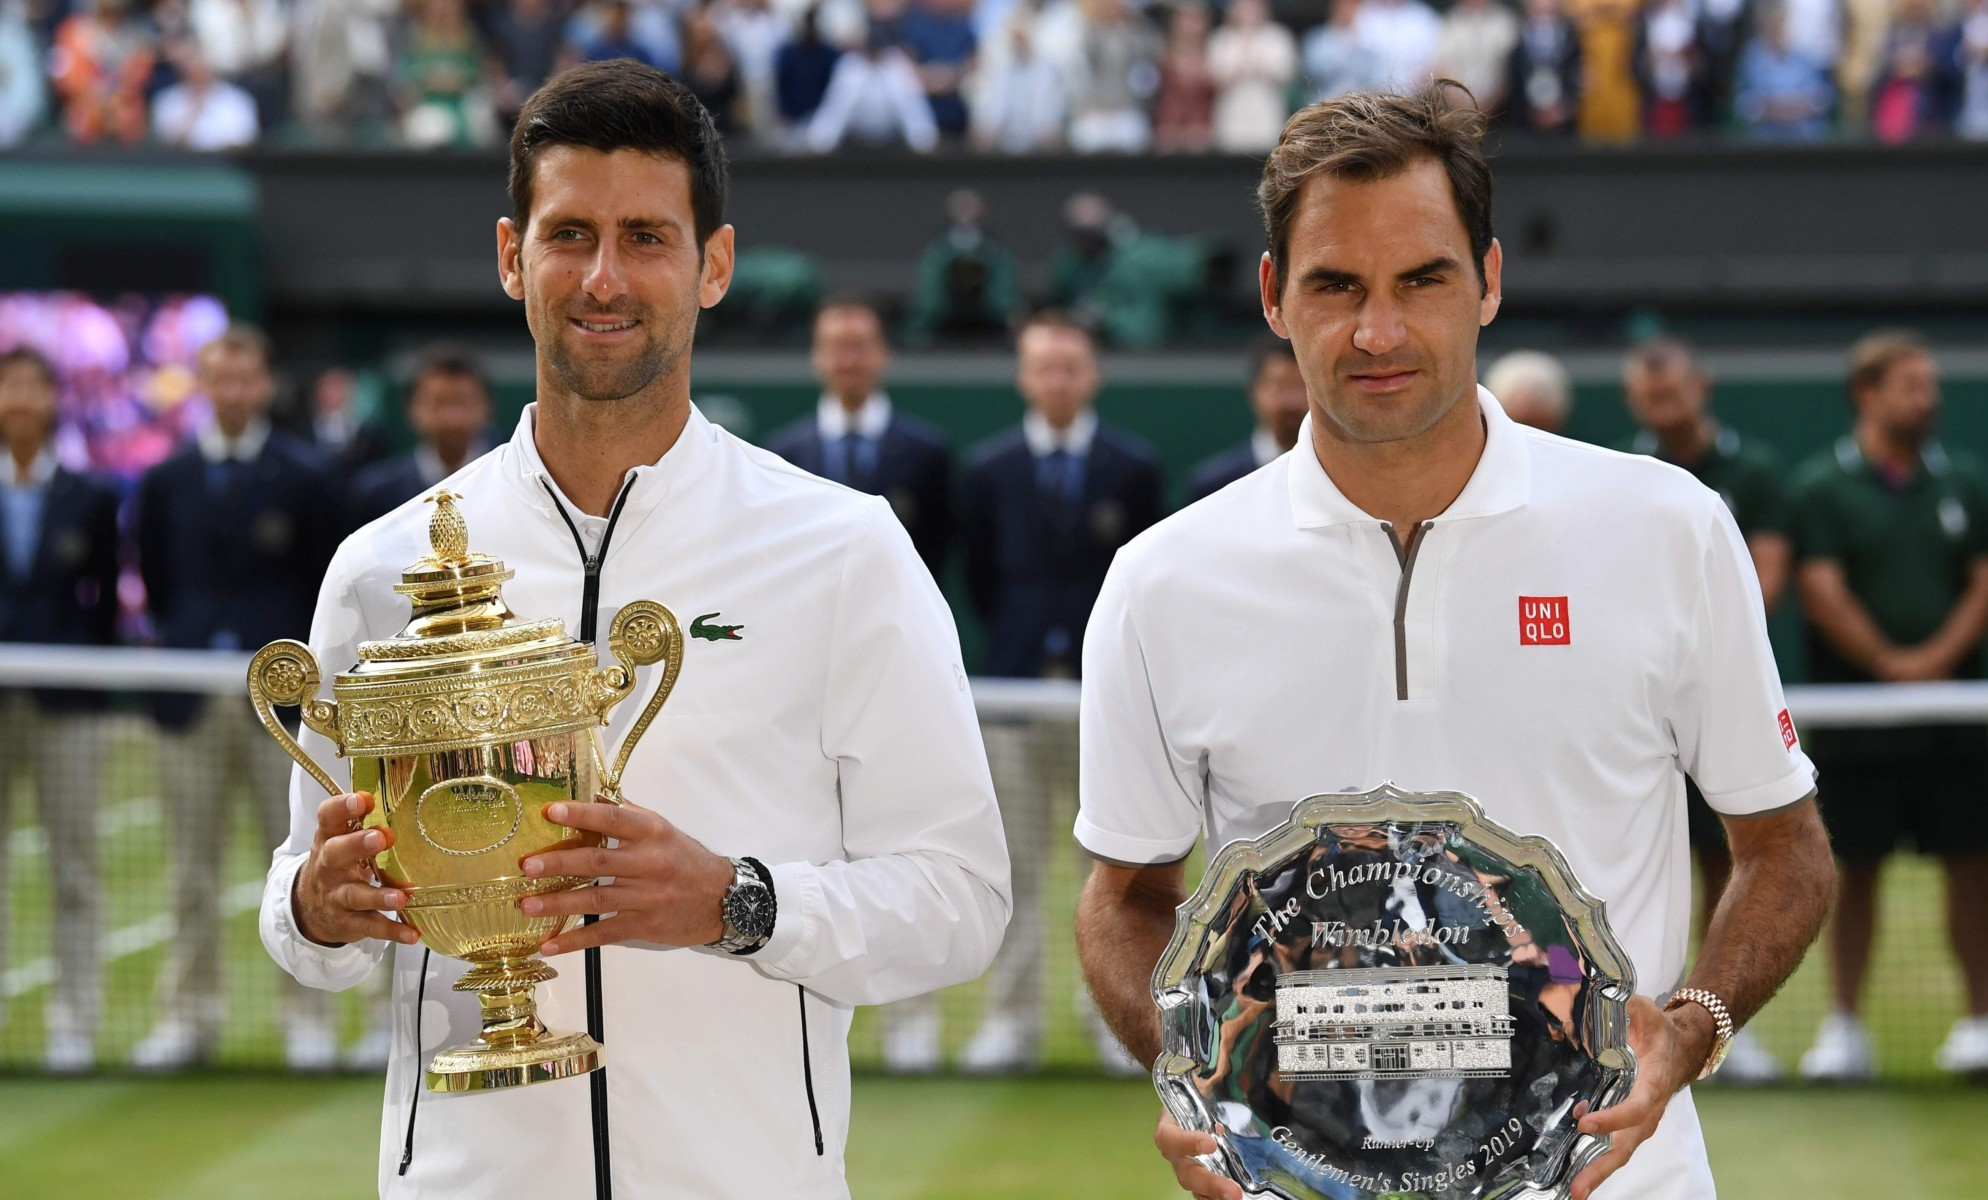 Novak Djokovid beat Roger Federer in a epic 2019 men's final